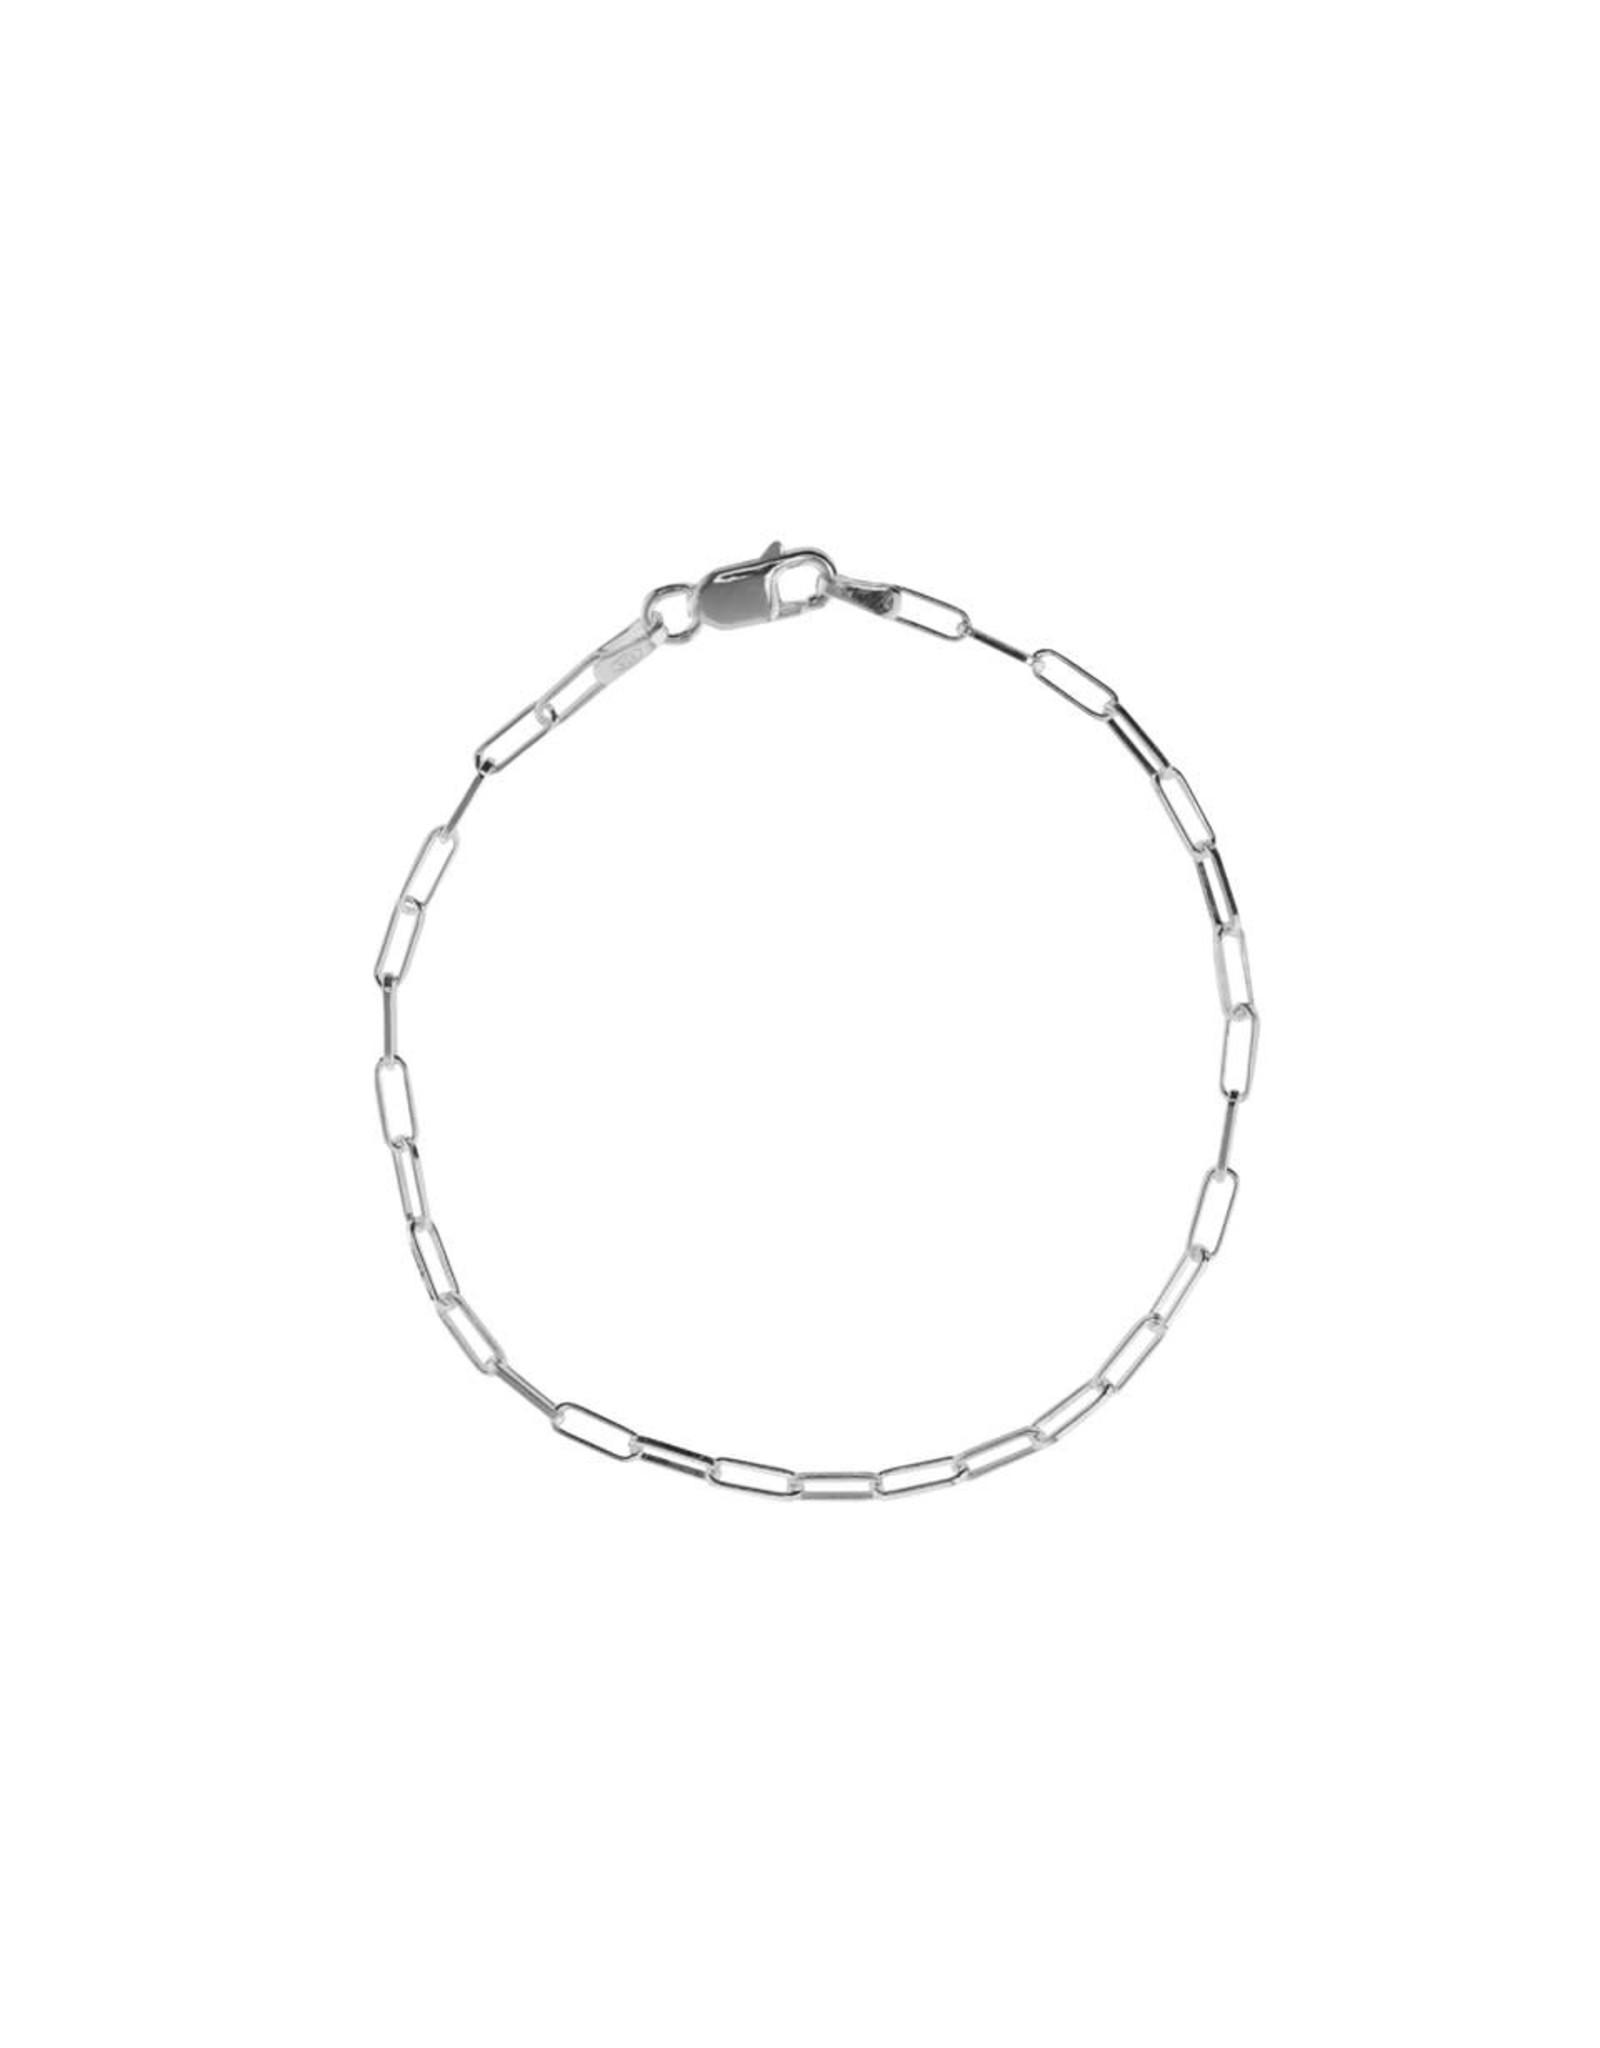 Xzota Xzota- Bracelet Chain Square Silver